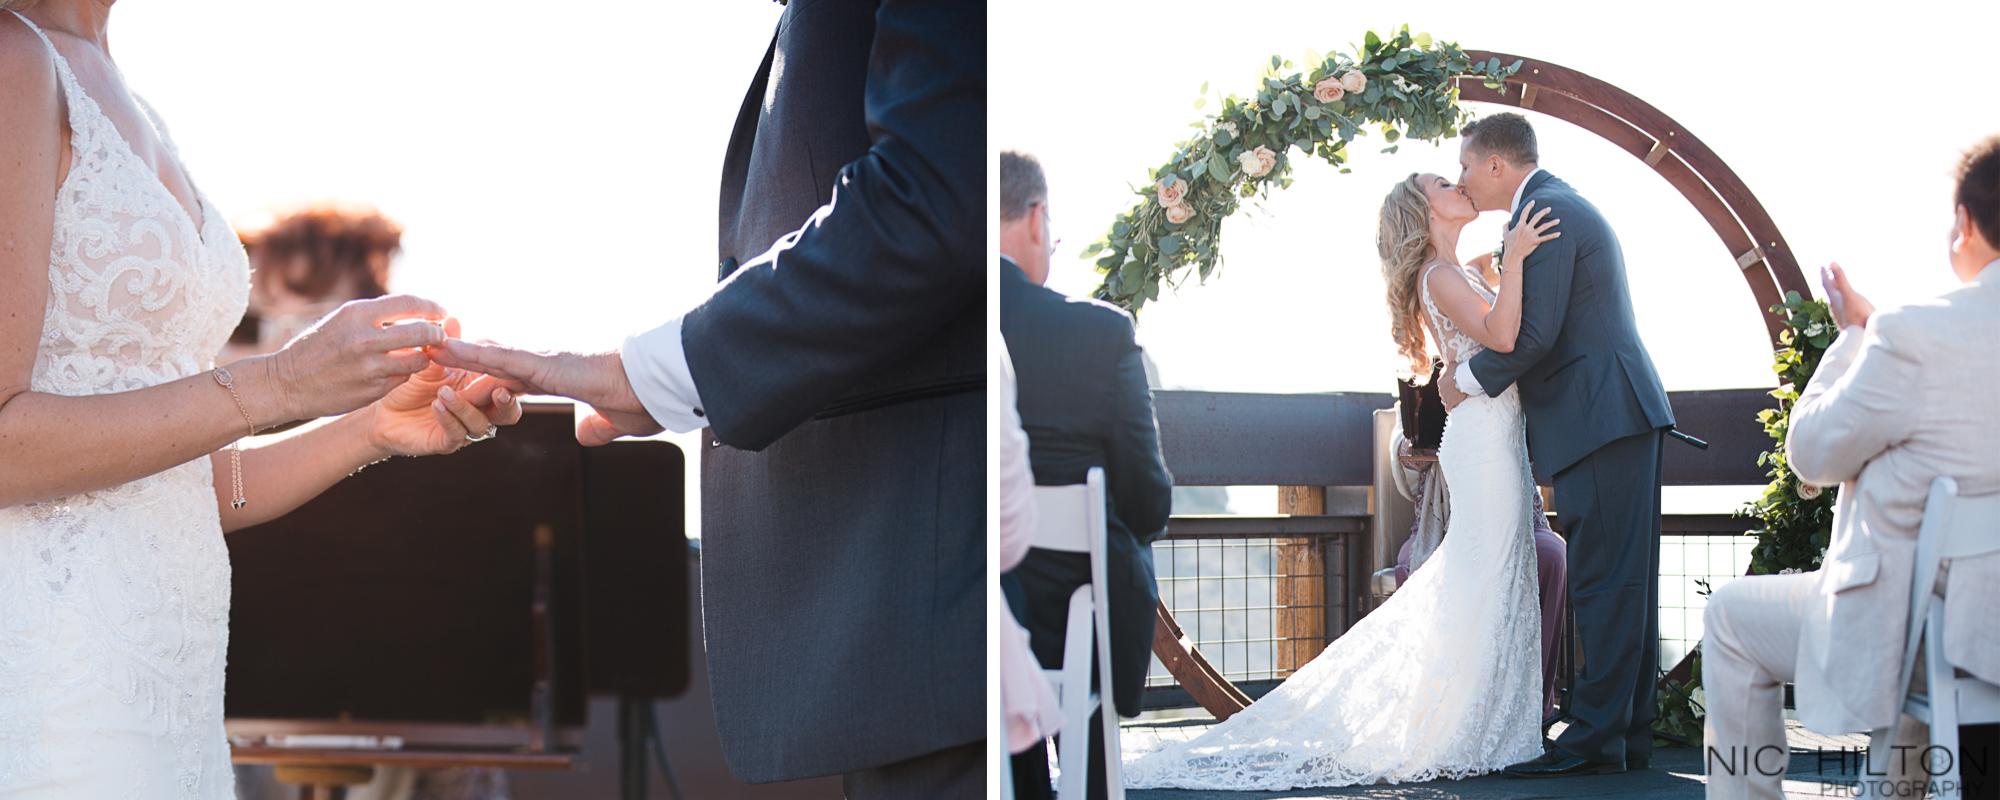 Mammoth-Mountain-Wedding-Ceremony-Mccoy-Station.jpg